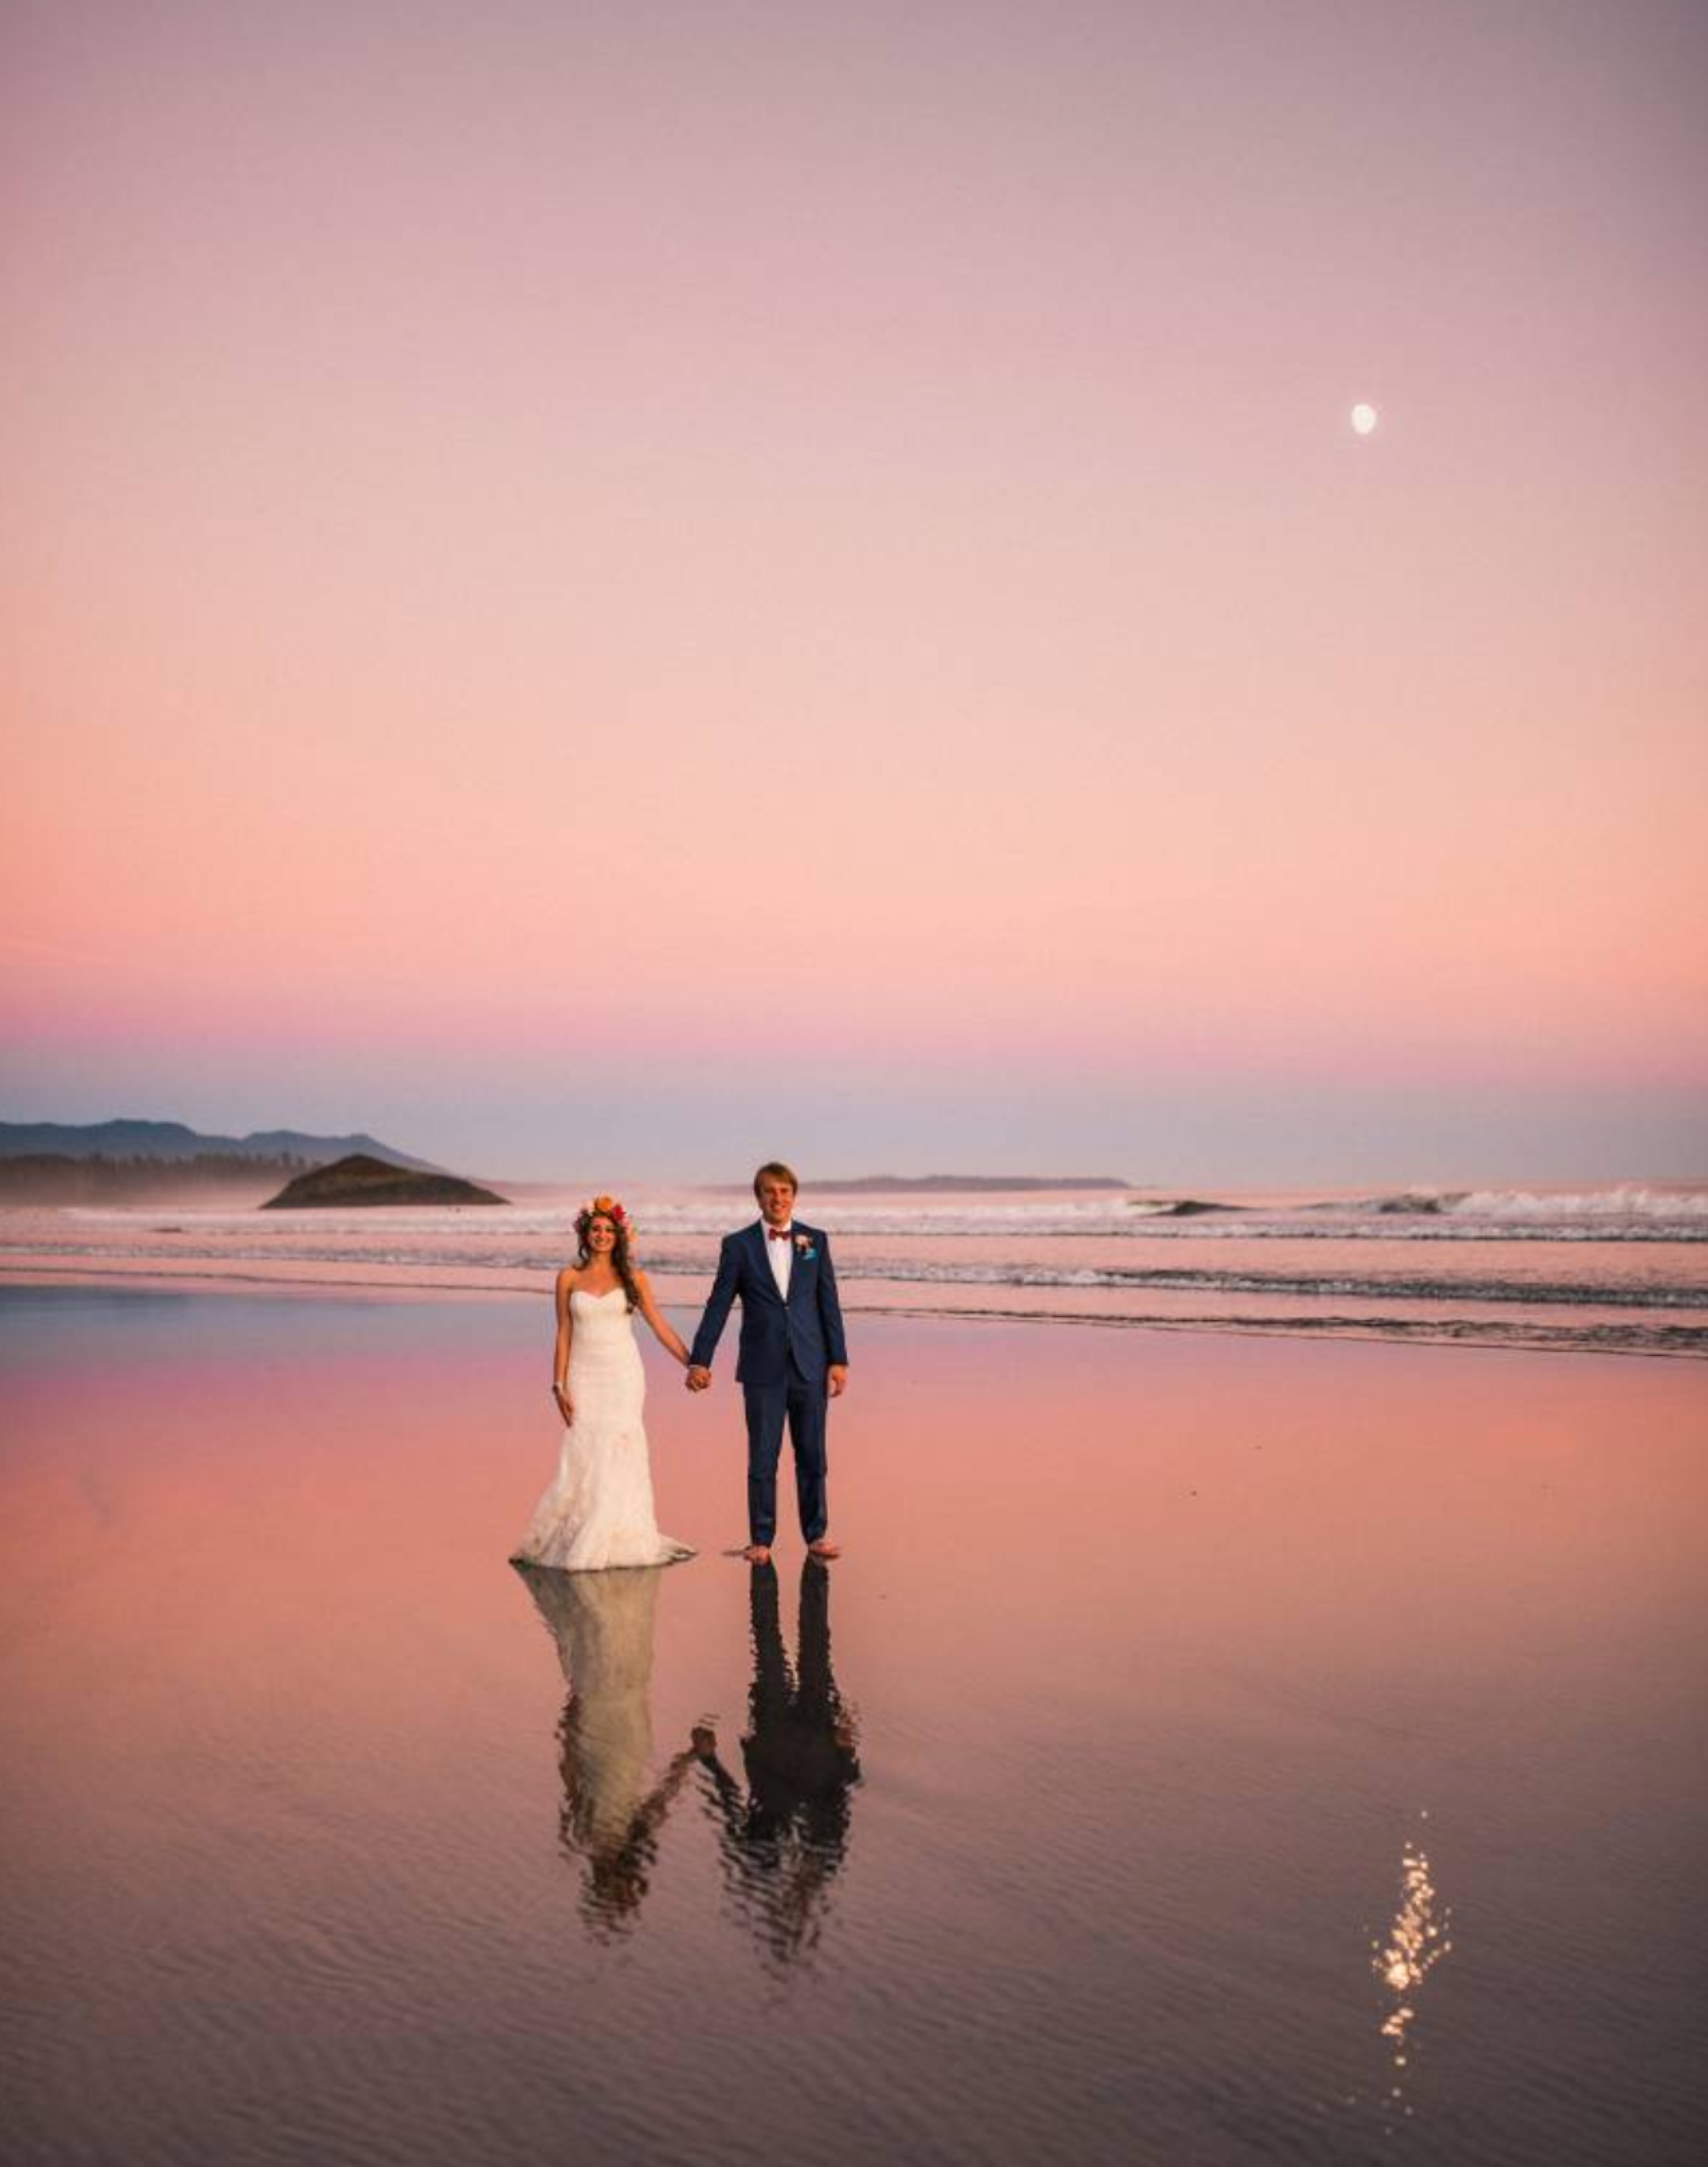 couple holding hand on beach sunset